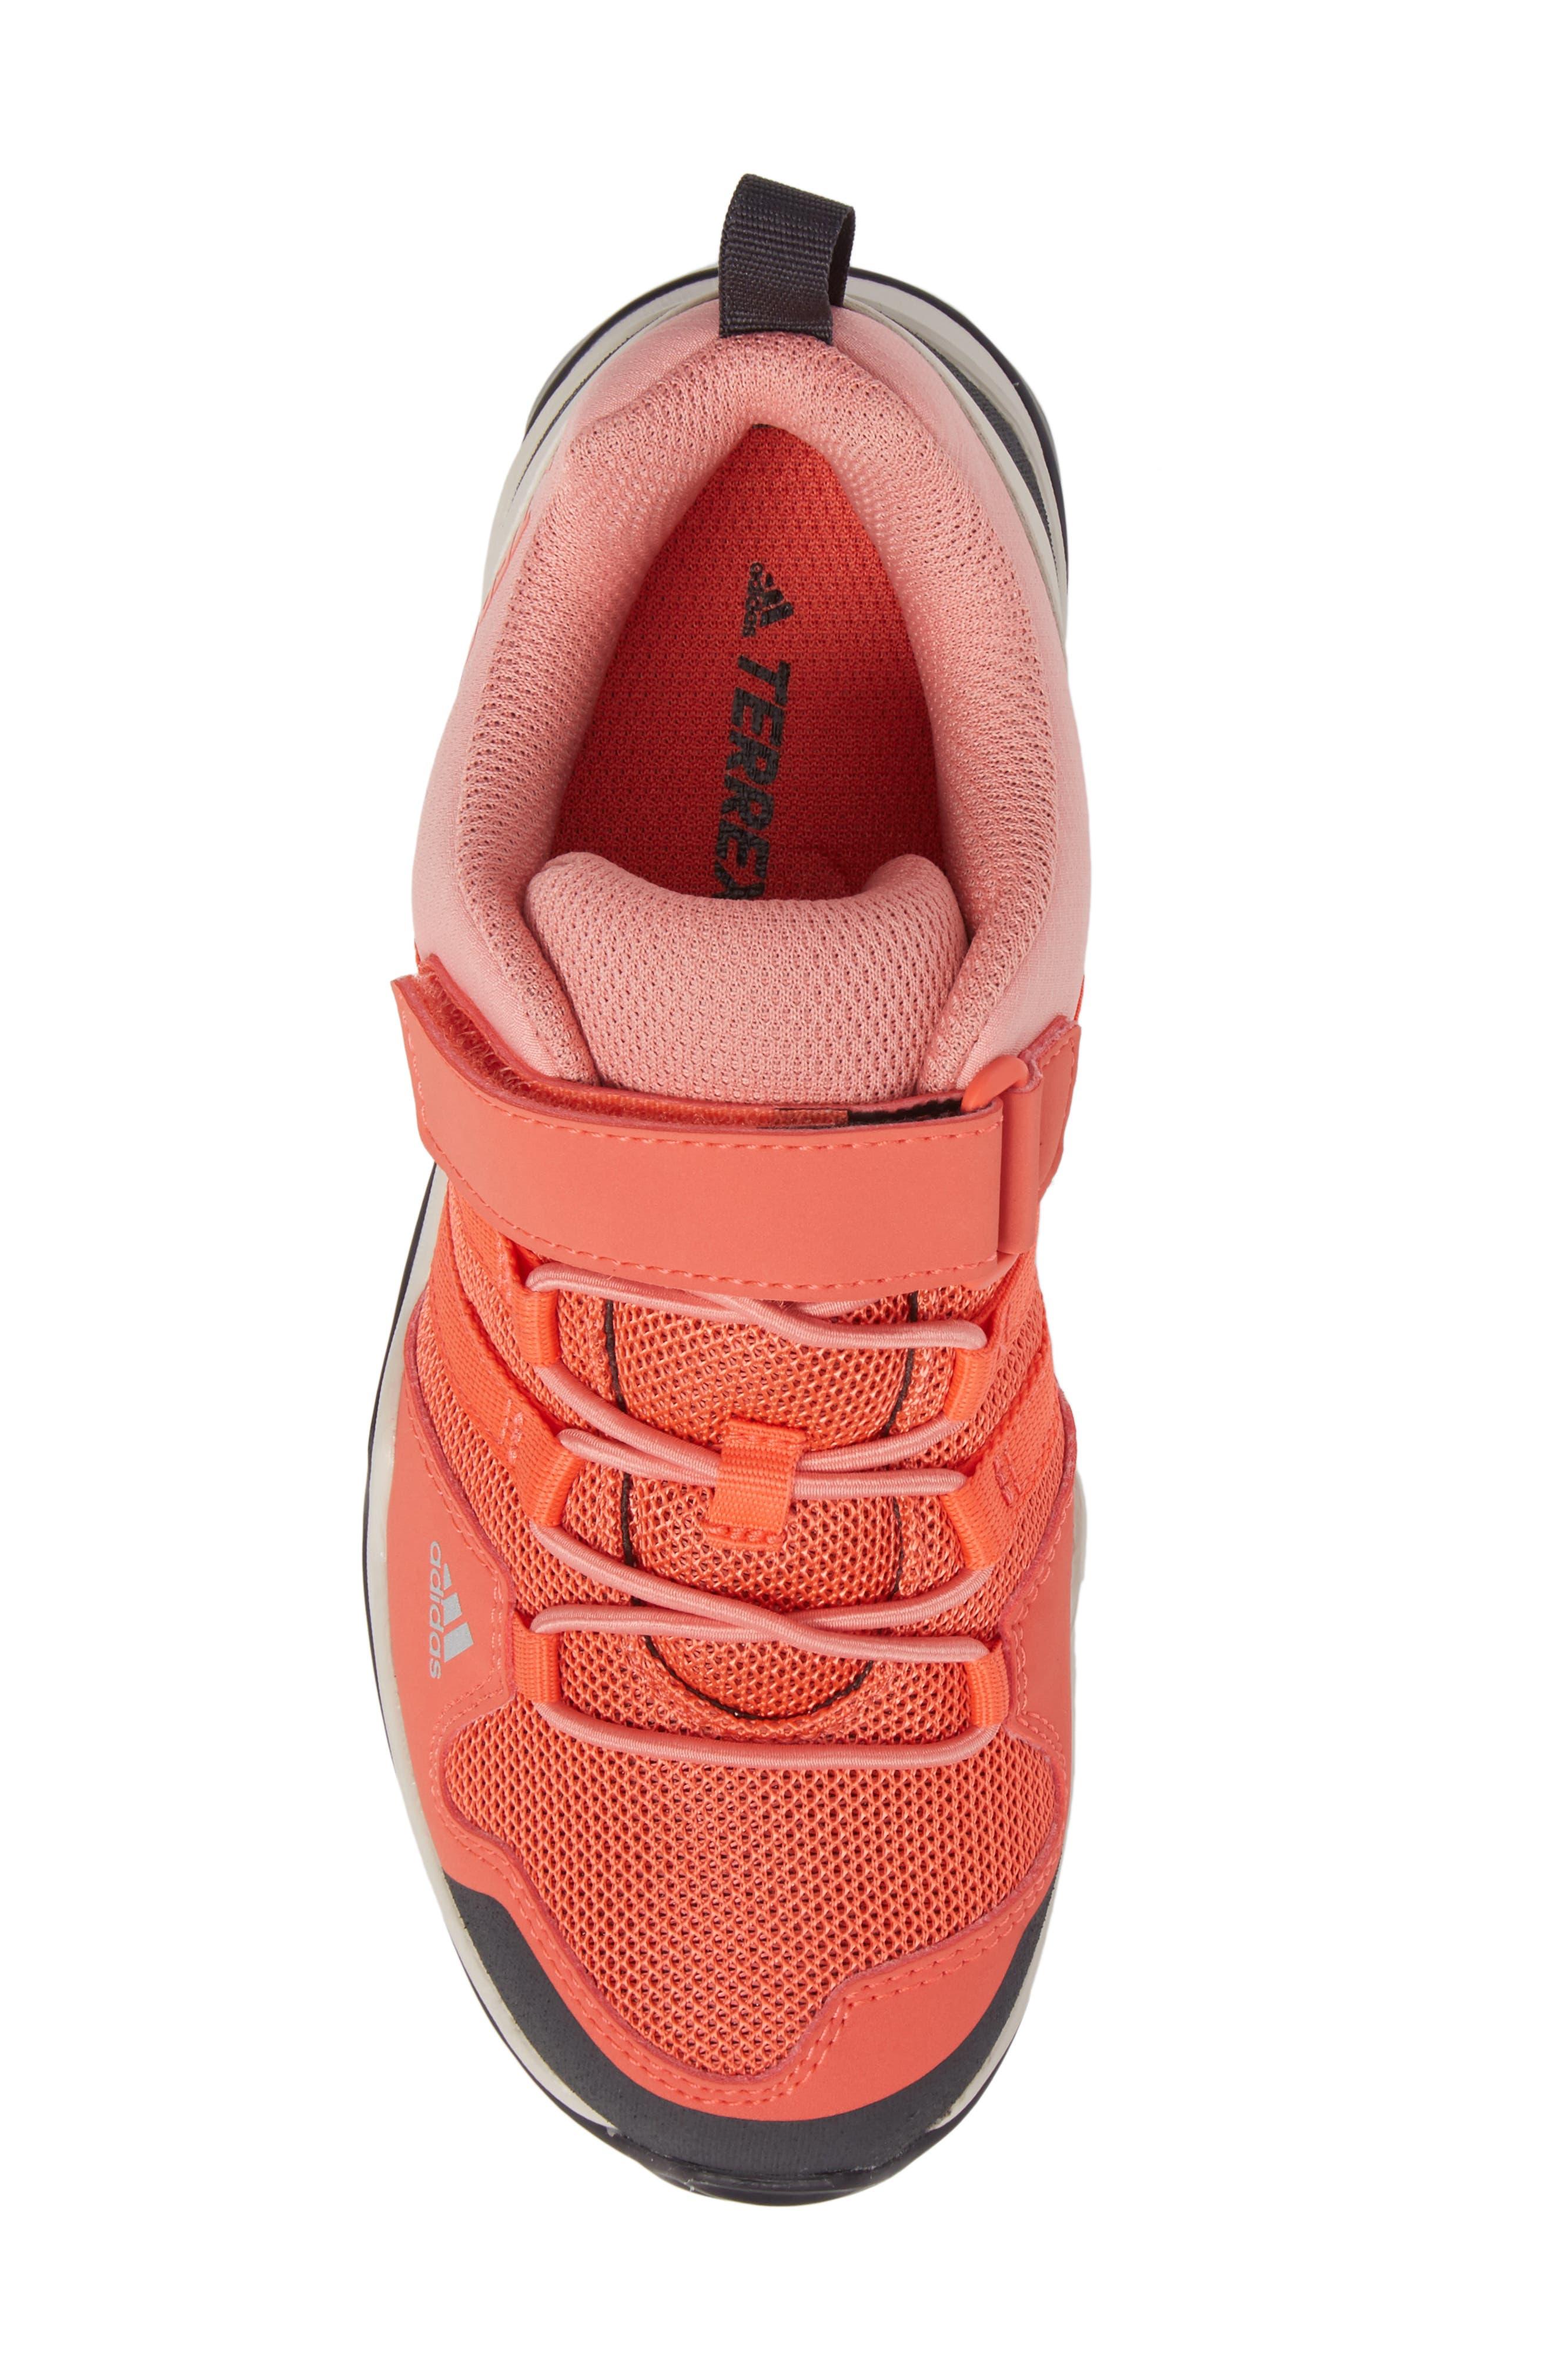 Terrex AX2R Sneaker,                             Alternate thumbnail 5, color,                             Easy Coral/ Tactile Rose